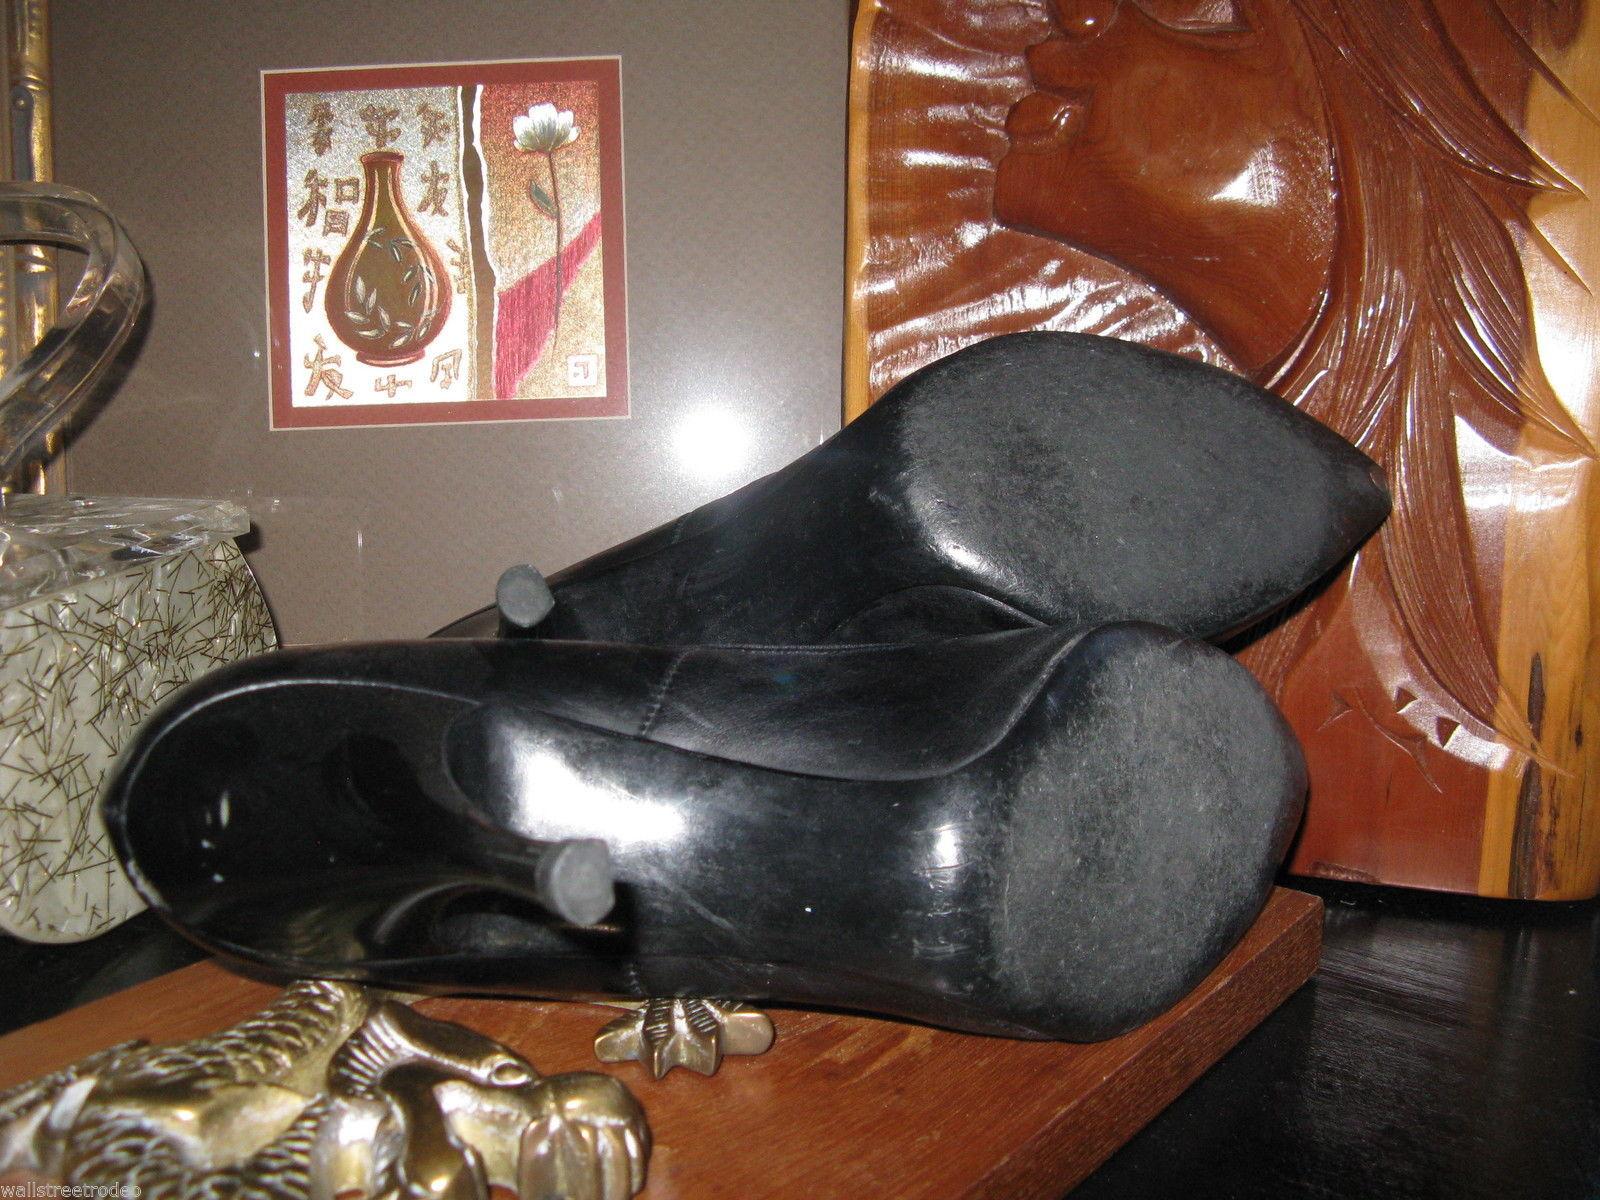 Smartaire vintage Debbie Renolds heels shoes 7 1/2 AAAA VLV 6 UK3.5 36 bonus VLV image 4